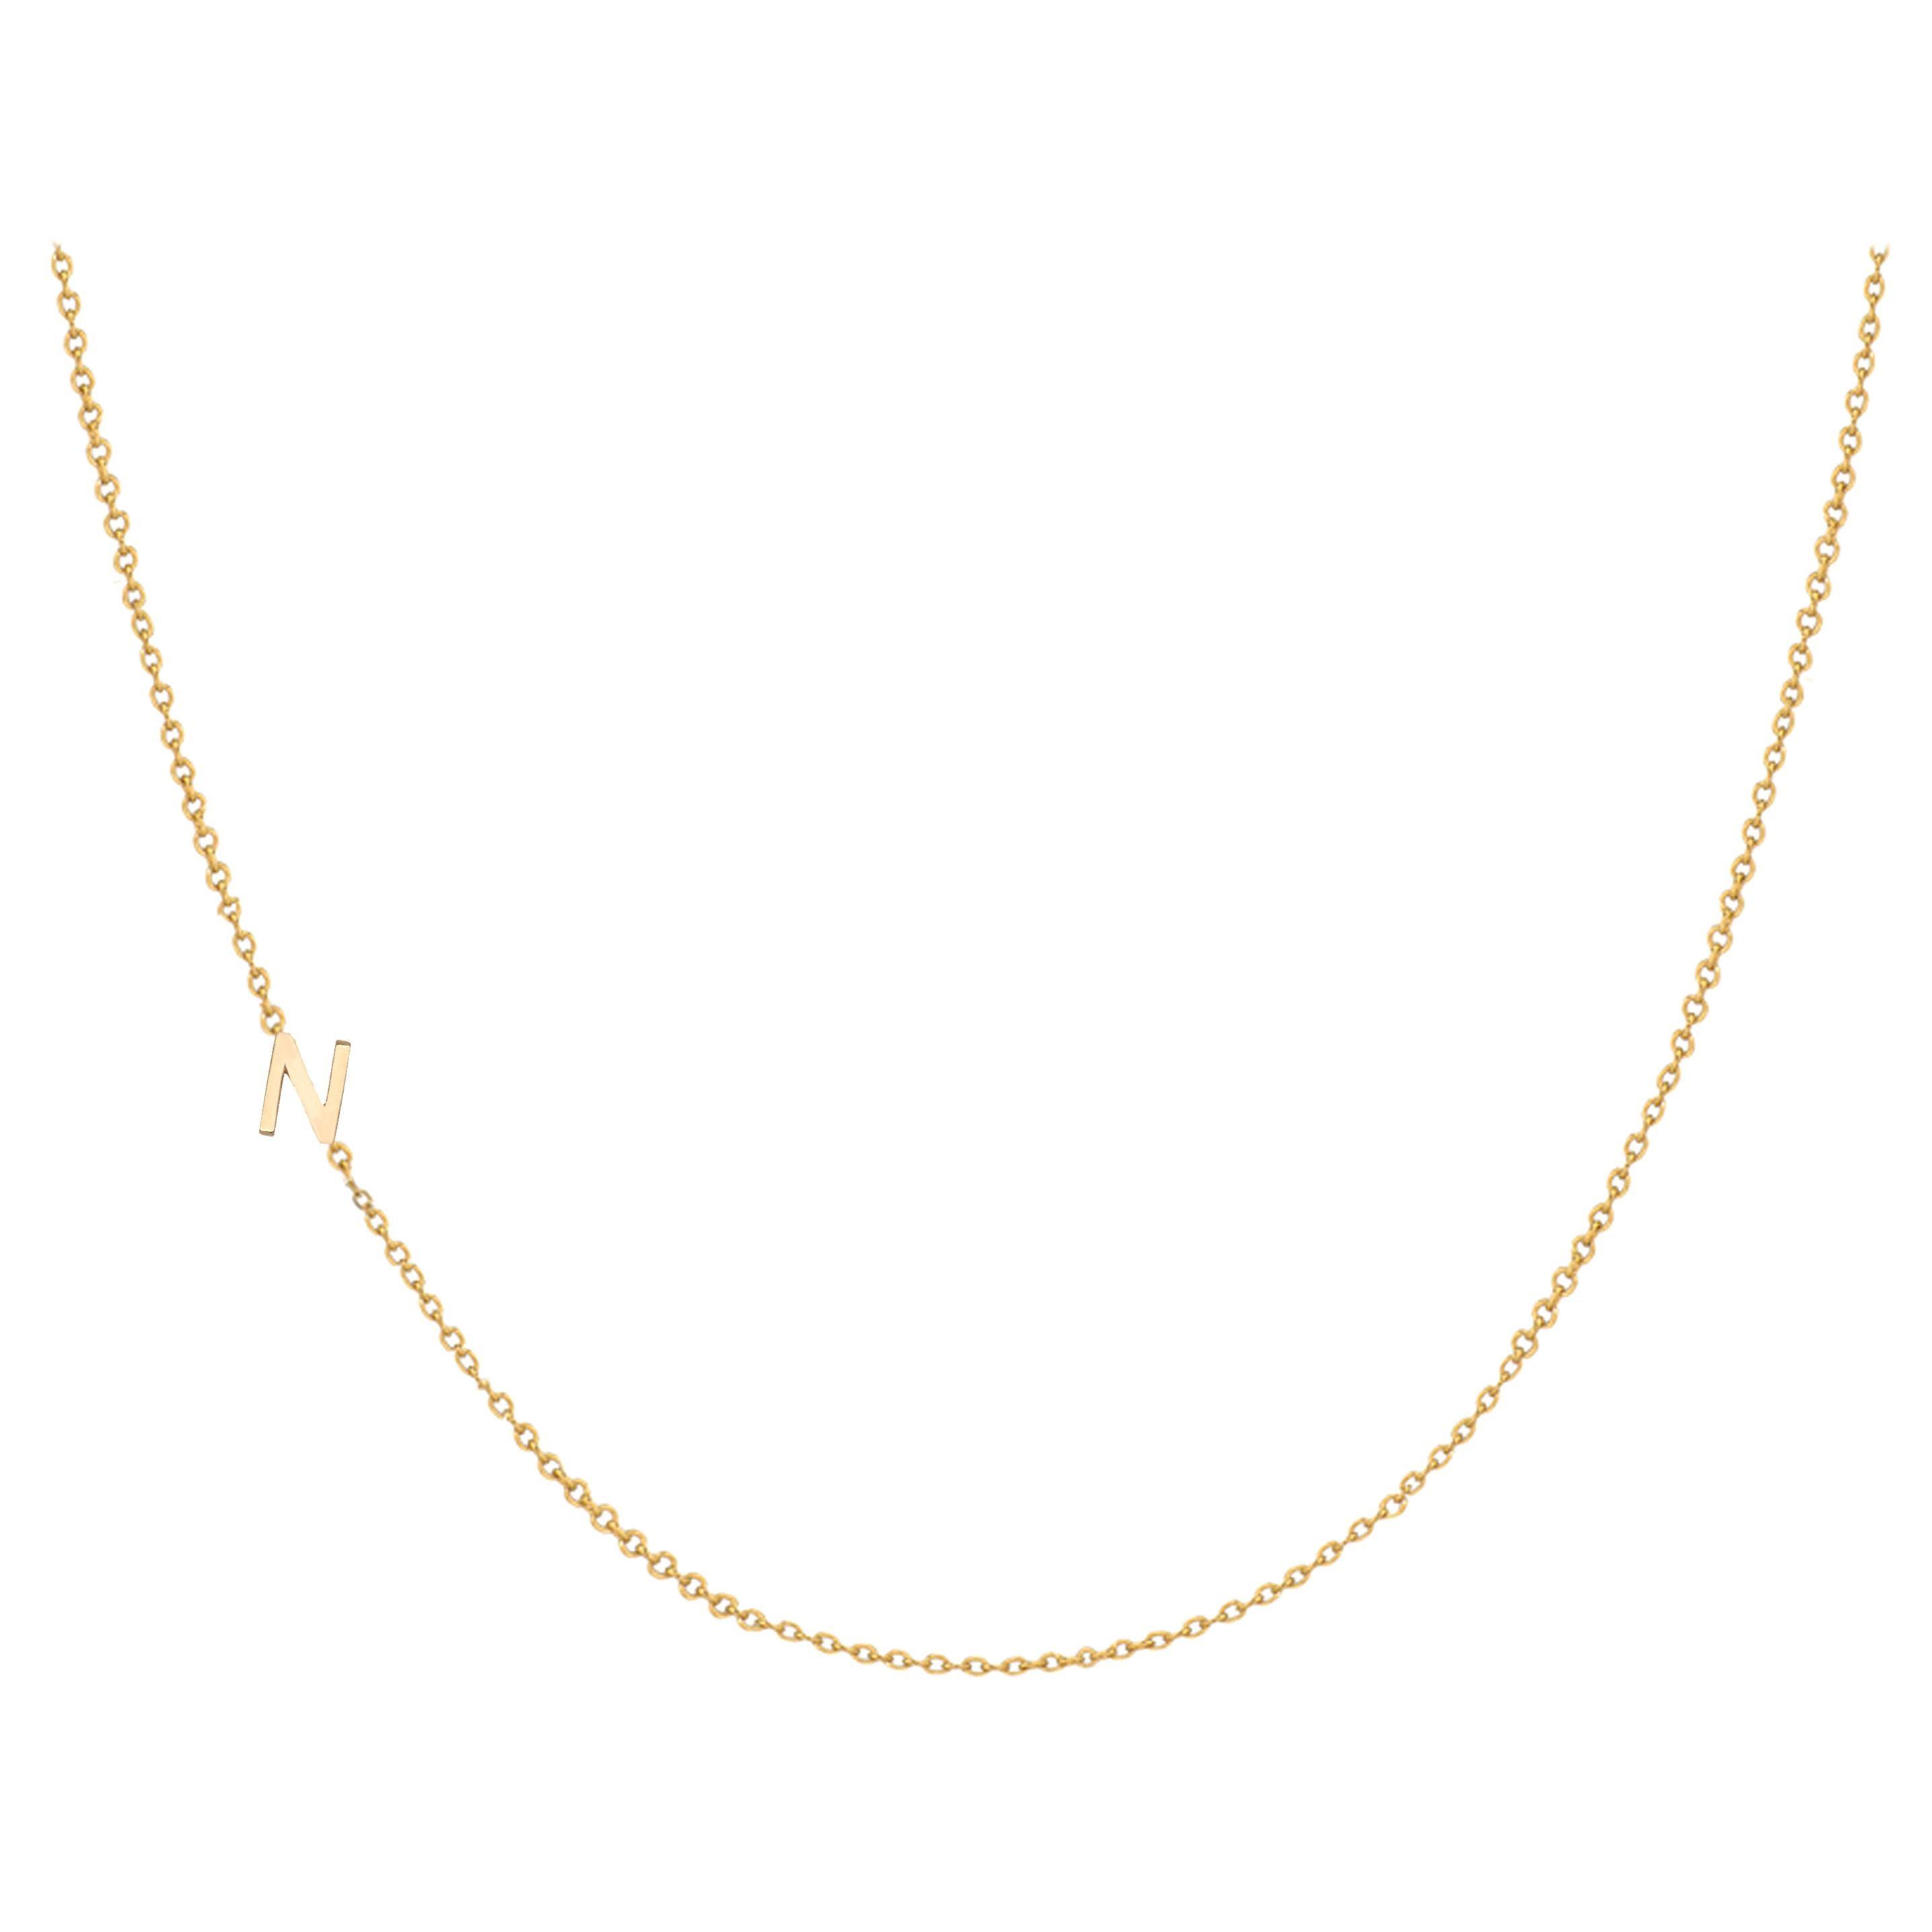 14 Karat Gold Asymmetrical Initial Necklace, N